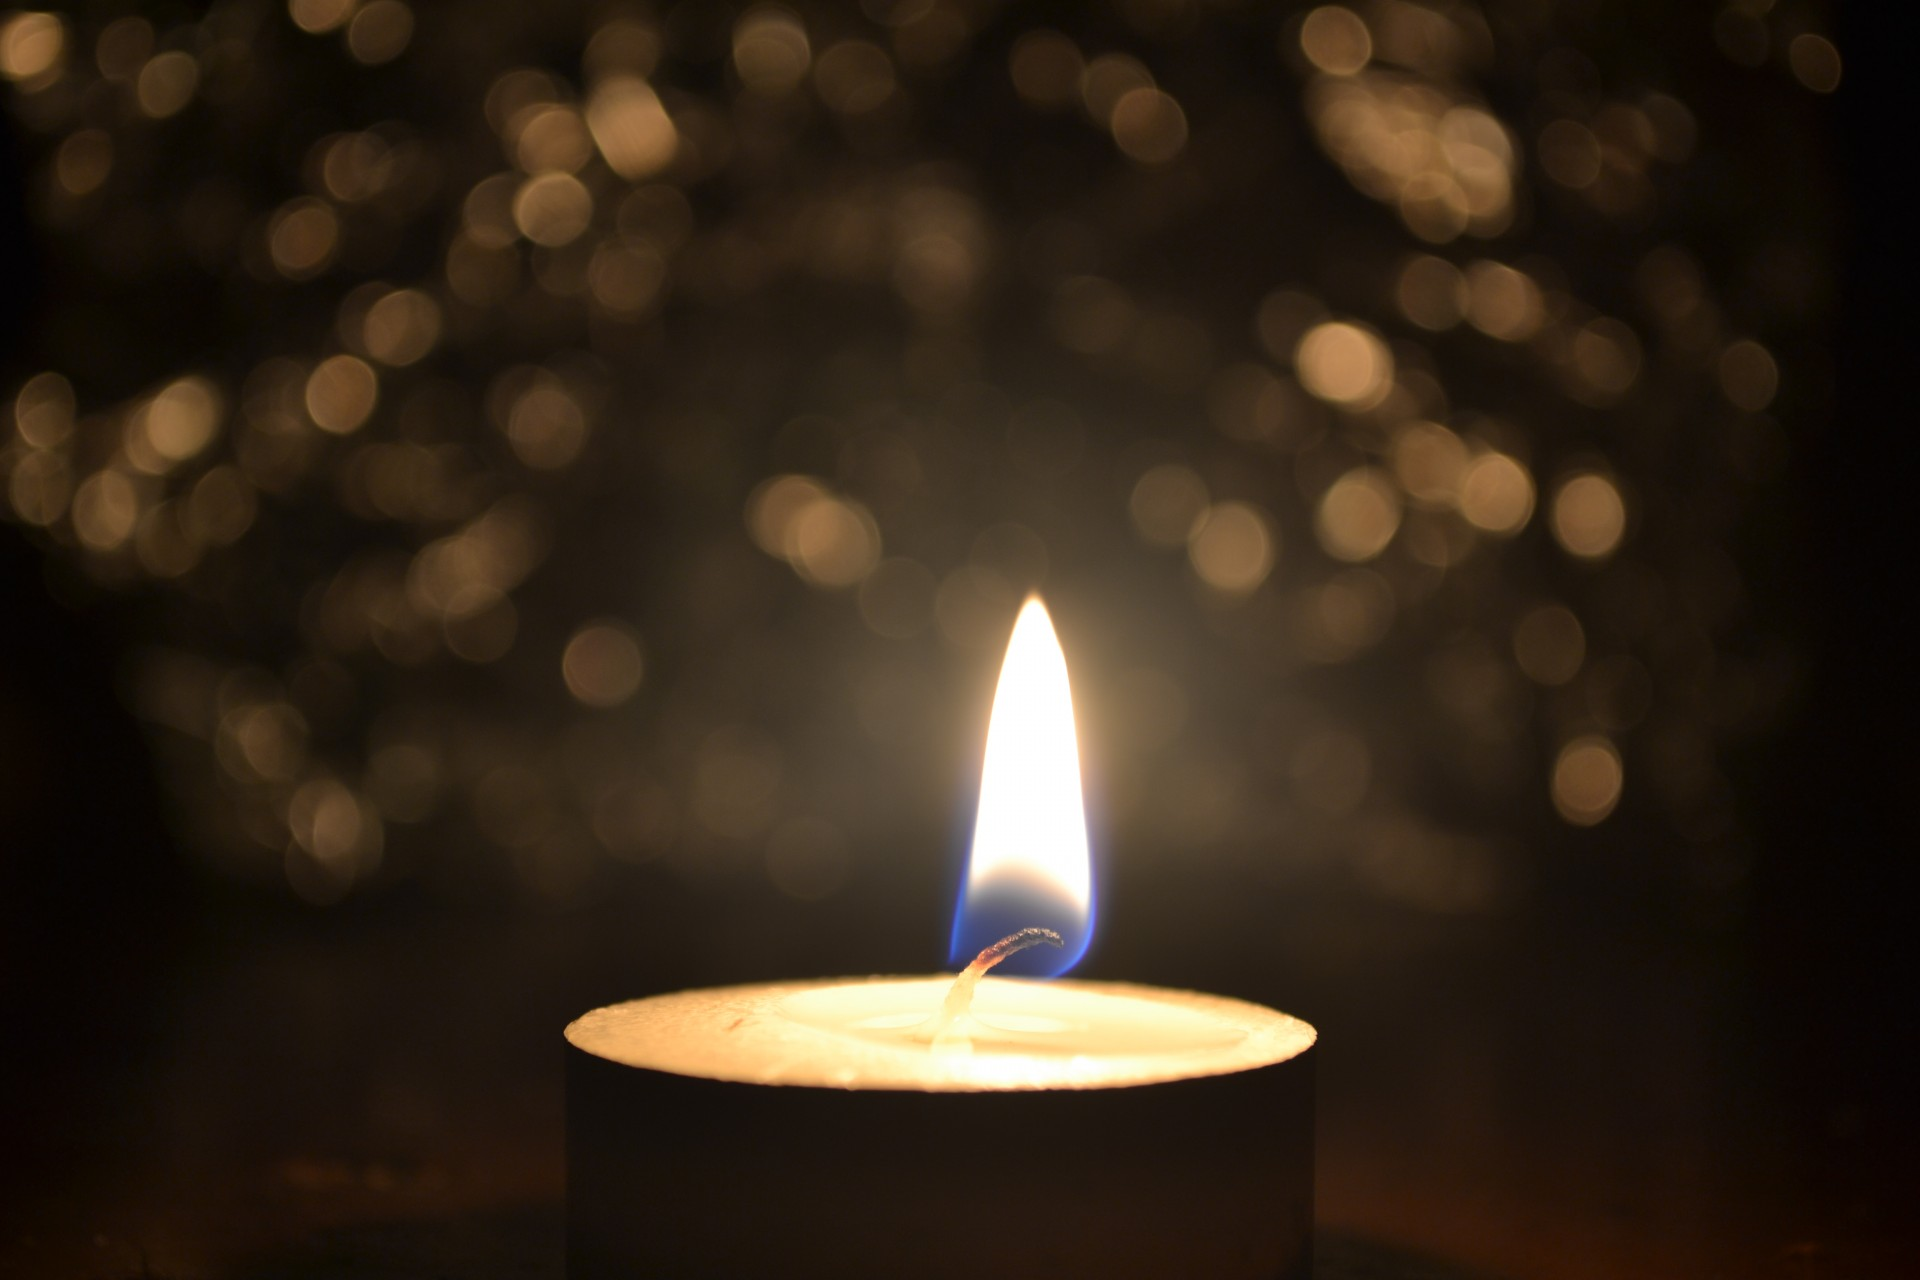 candle-light-1372261233NjQ.jpg